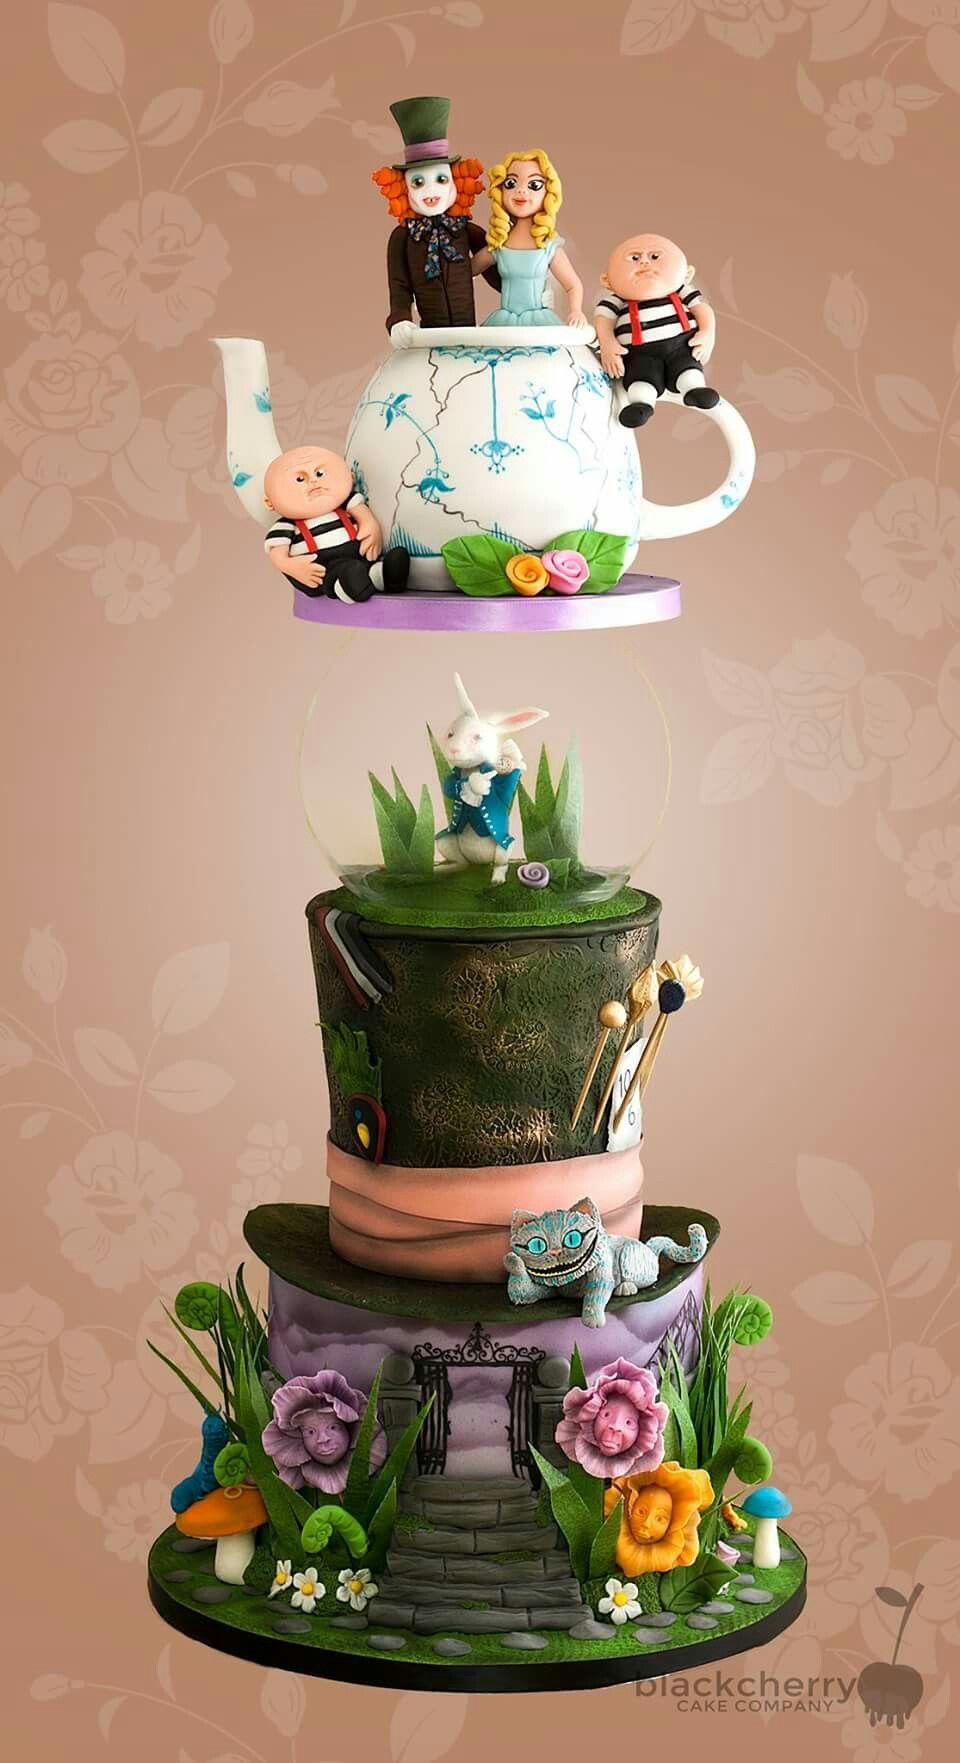 Blackcherry Cake Company  Cake  Gteau gravity Gteaux